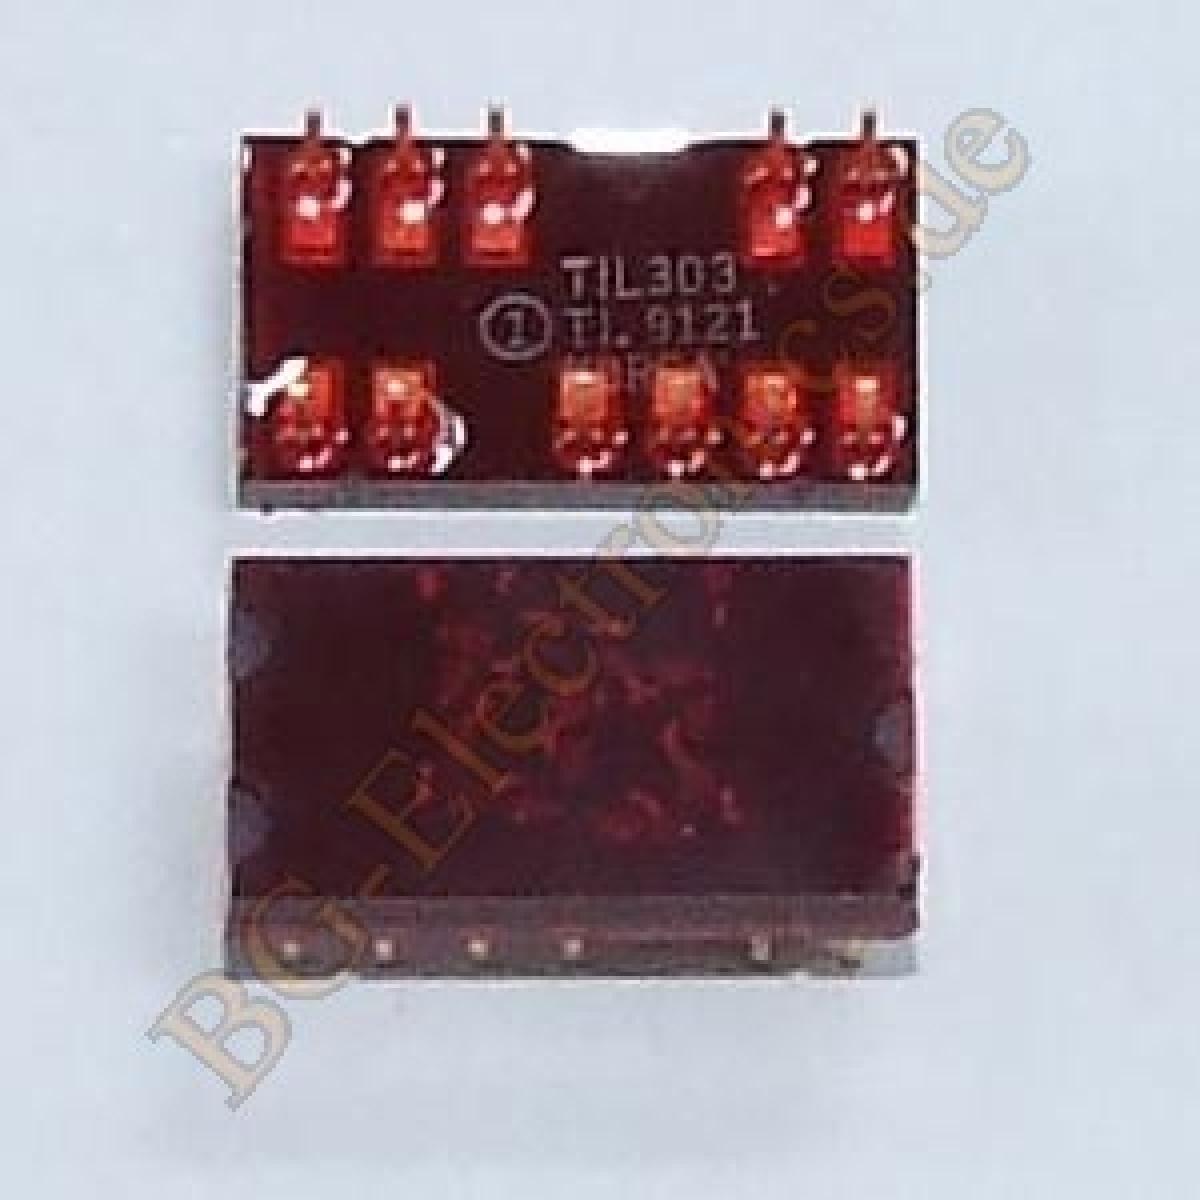 1-x-TIL303-7-Seven-Sieben-Segment-Anzeige-Display-red-Rot-TI-DIP-14-1pcs